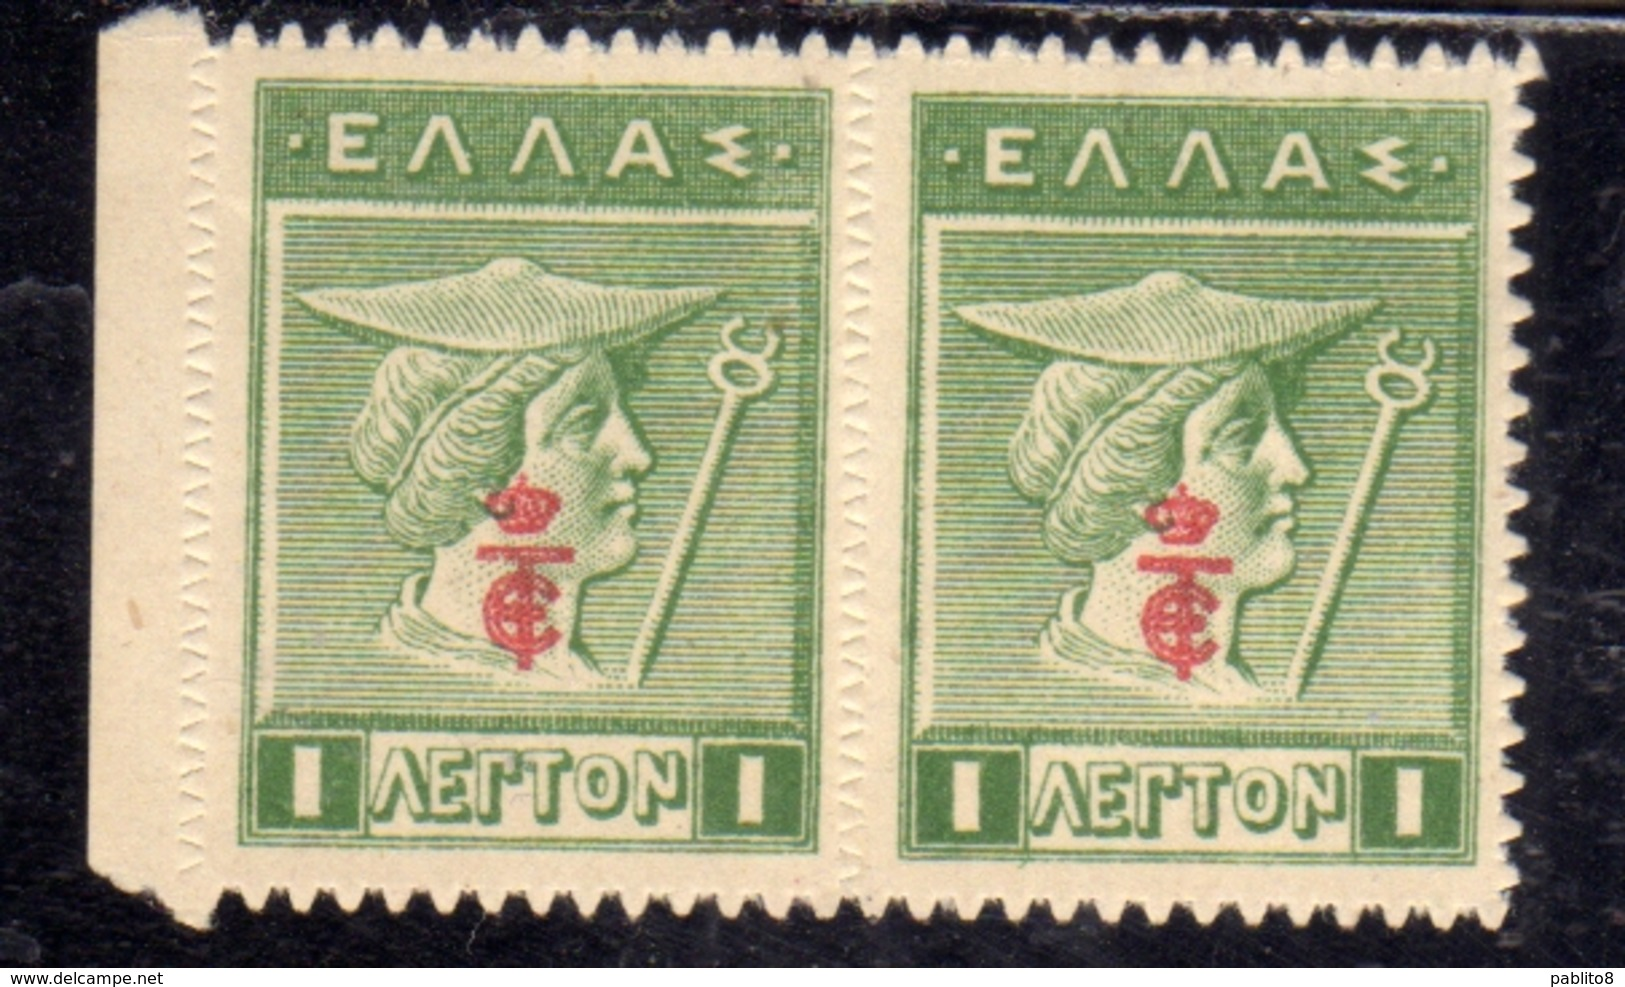 GREECE GRECIA HELLAS 1916 HERMES MERCURY MERCURIO RED OVERPRINTED PAIR LEPTA 1l MNH - Grecia